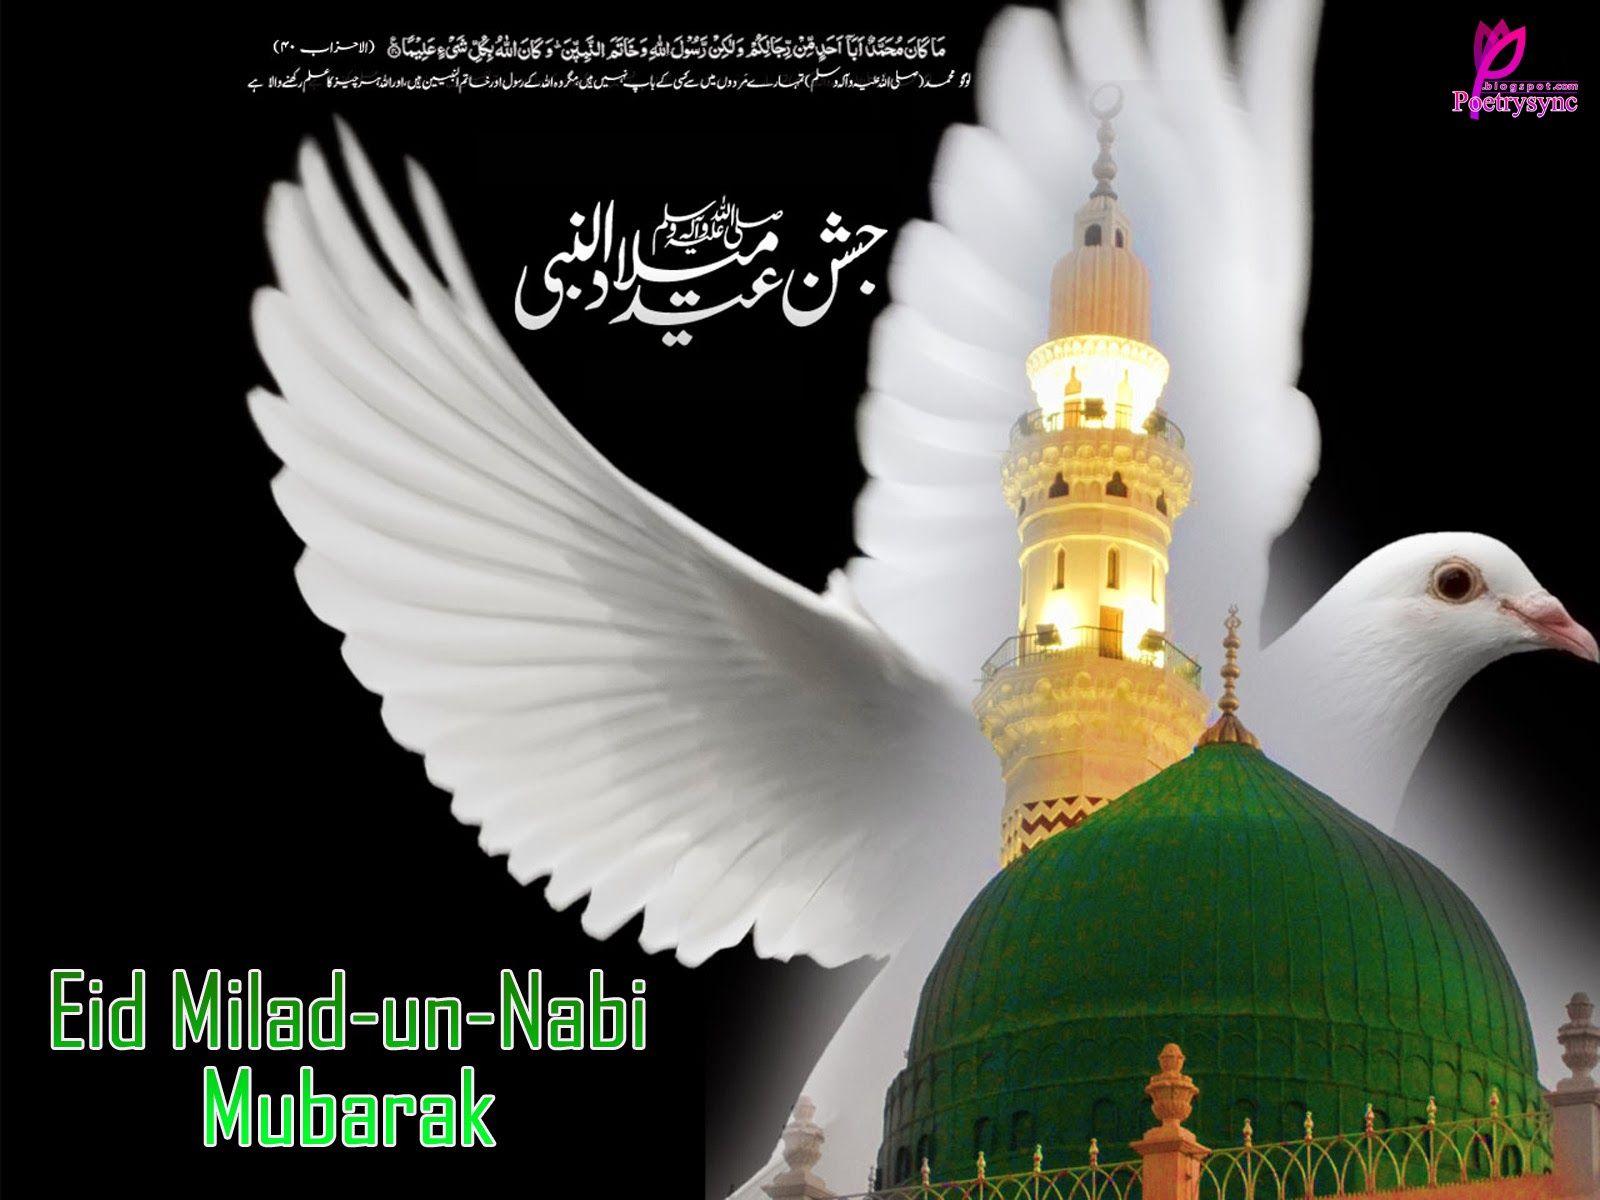 poetry eid milad un nabi wishes cards images with urdu sms eid milad un nabi eid milad milad un nabi poetry eid milad un nabi wishes cards